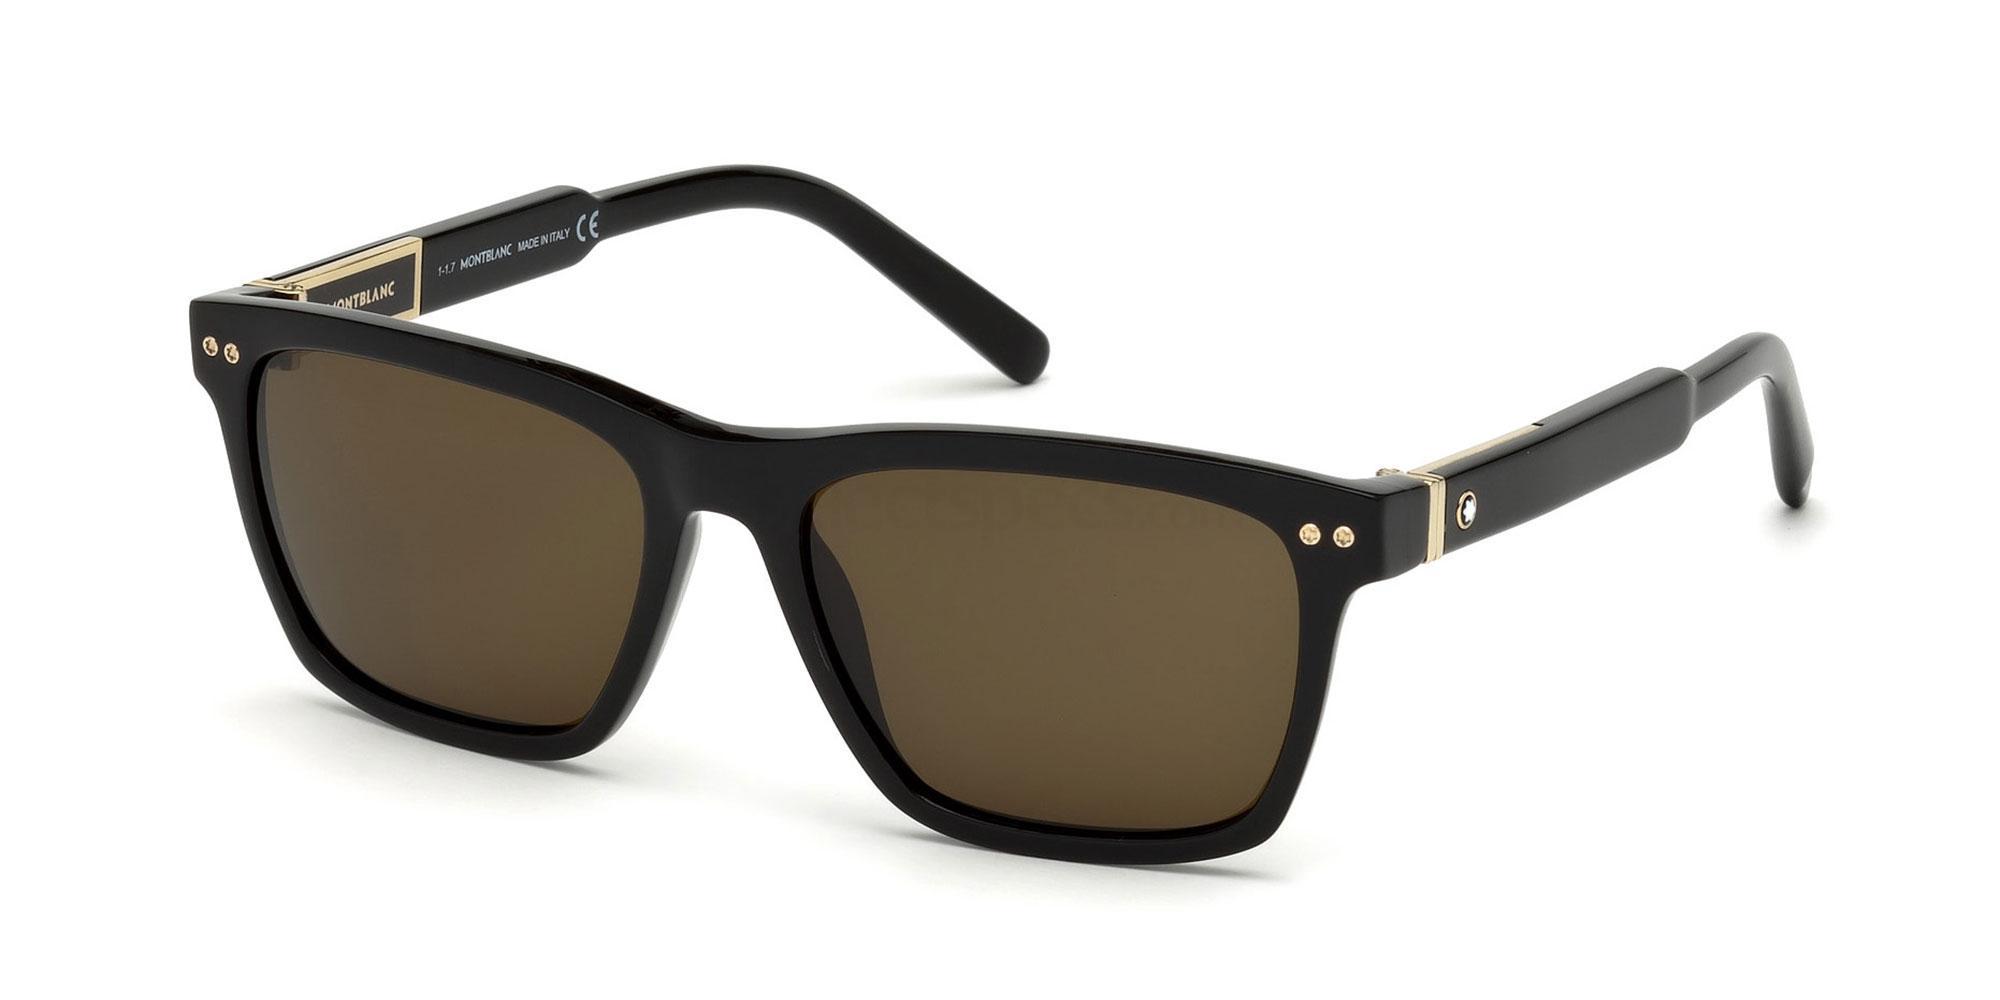 01J MB694S Sunglasses, Mont Blanc